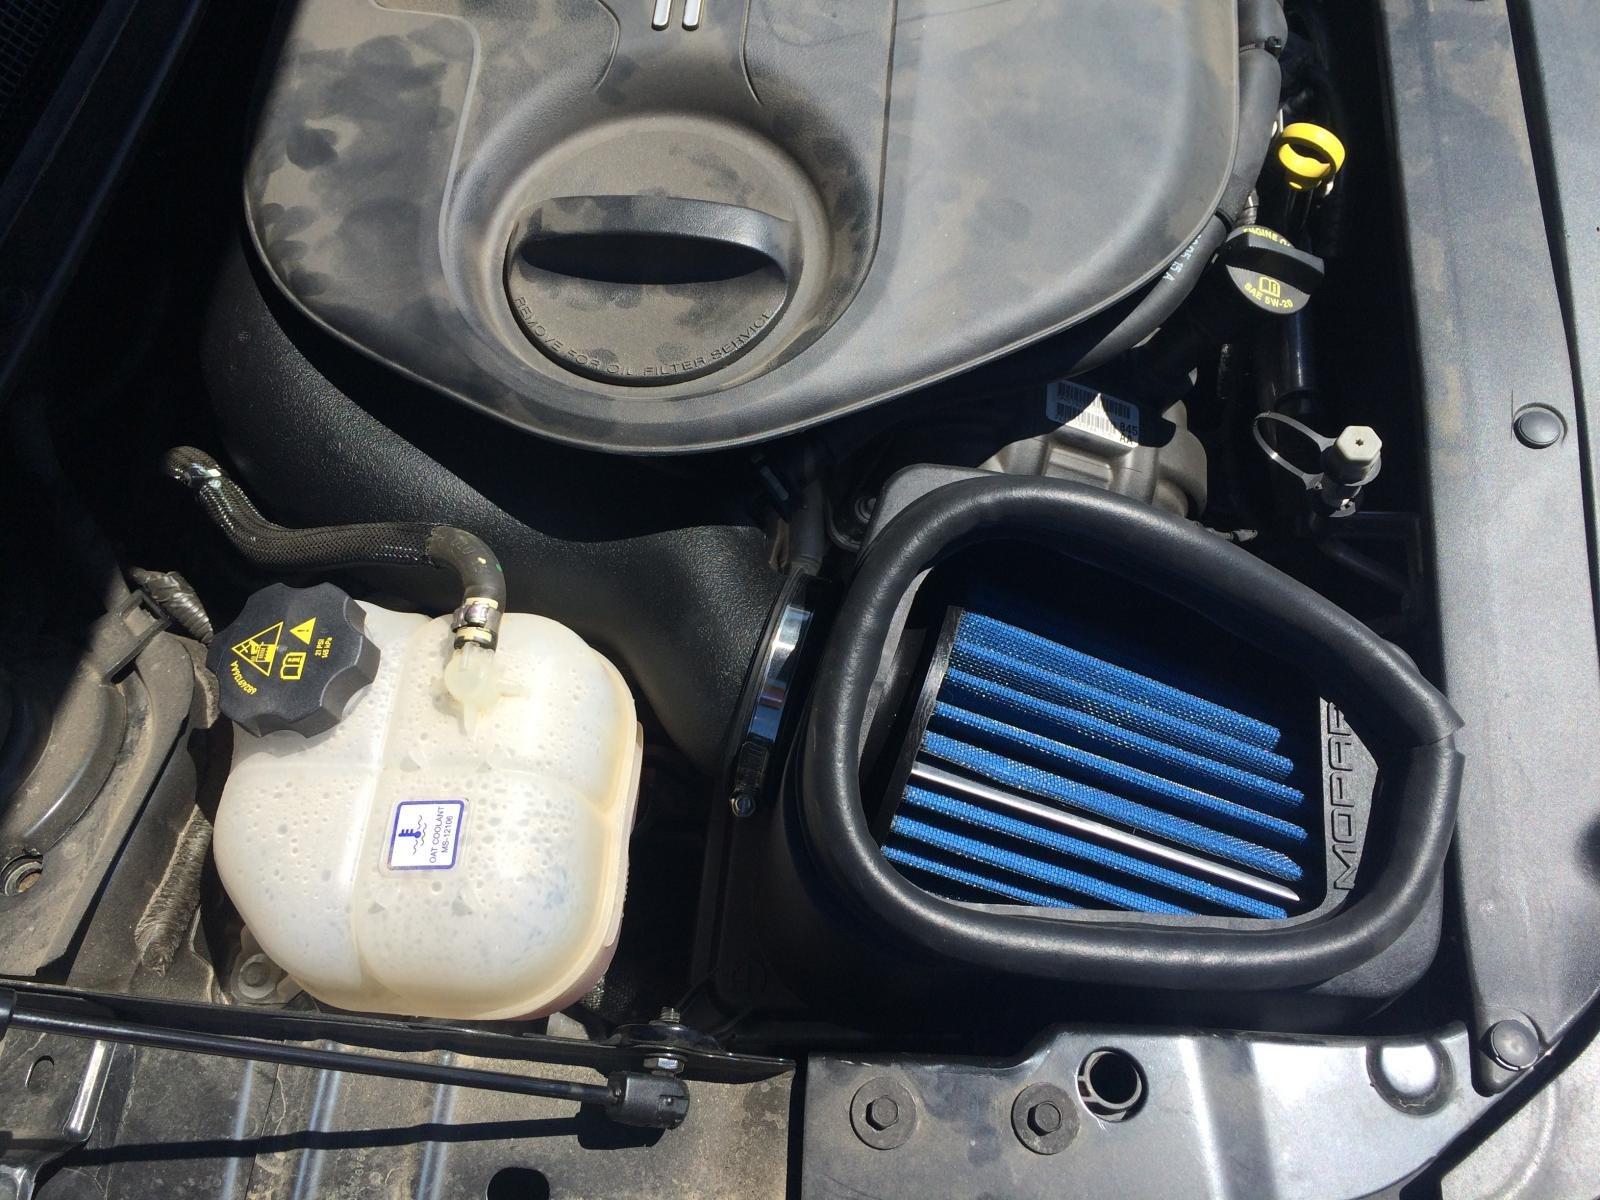 Thread: 2015 Chrysler 200 S AWD 3.6L - Mopar Cold Air Intake Installed